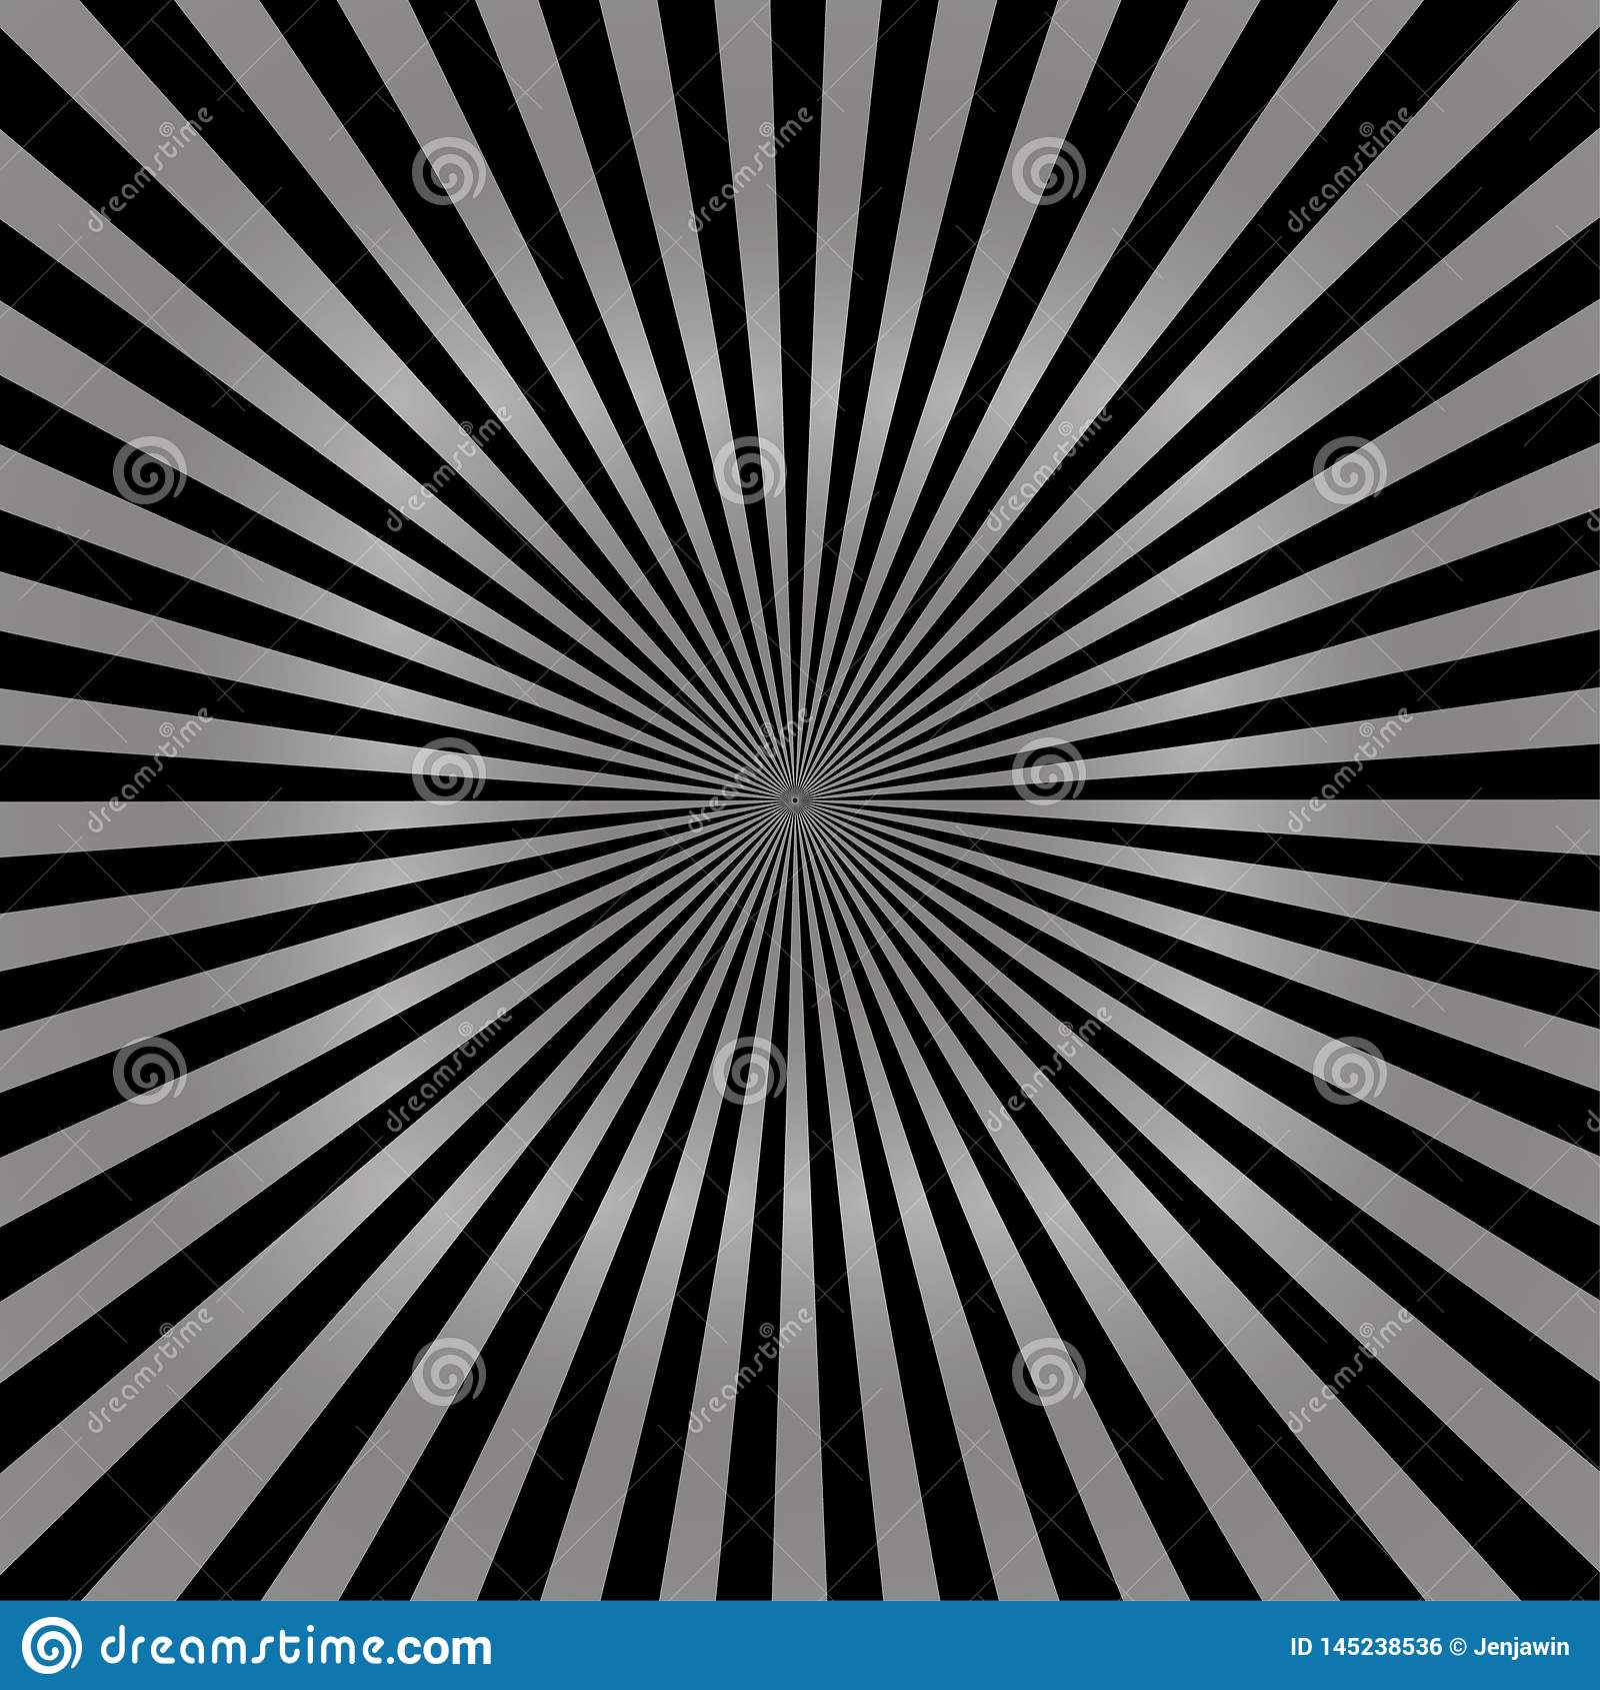 125f9ff1782 Grey Sun Rays Sunburst On Black Pattern Vector Eps10. Grey And Black ...